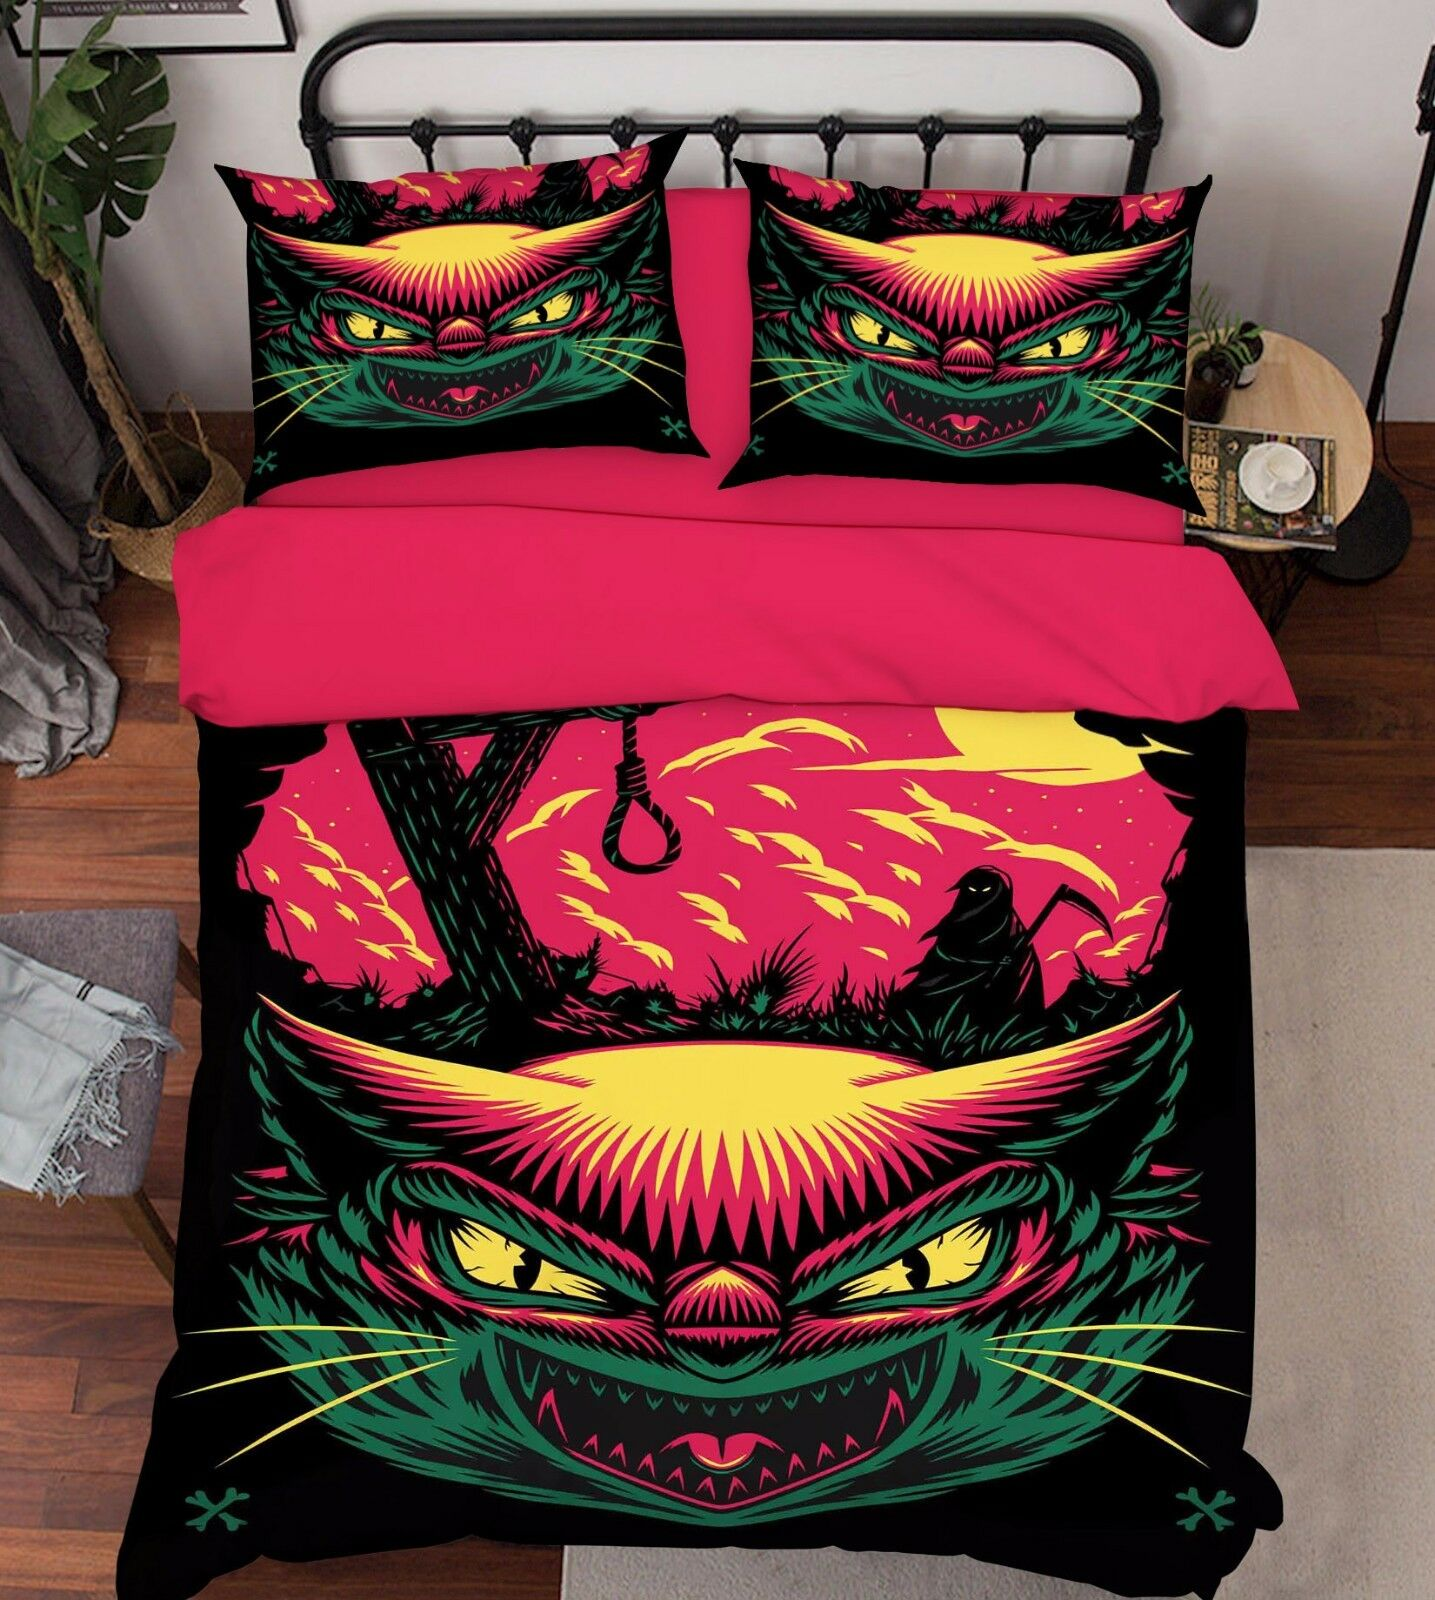 3D Vicious Owl Painting 41 Bed Pillowcases Quilt Duvet Cover Set Single Queen CA